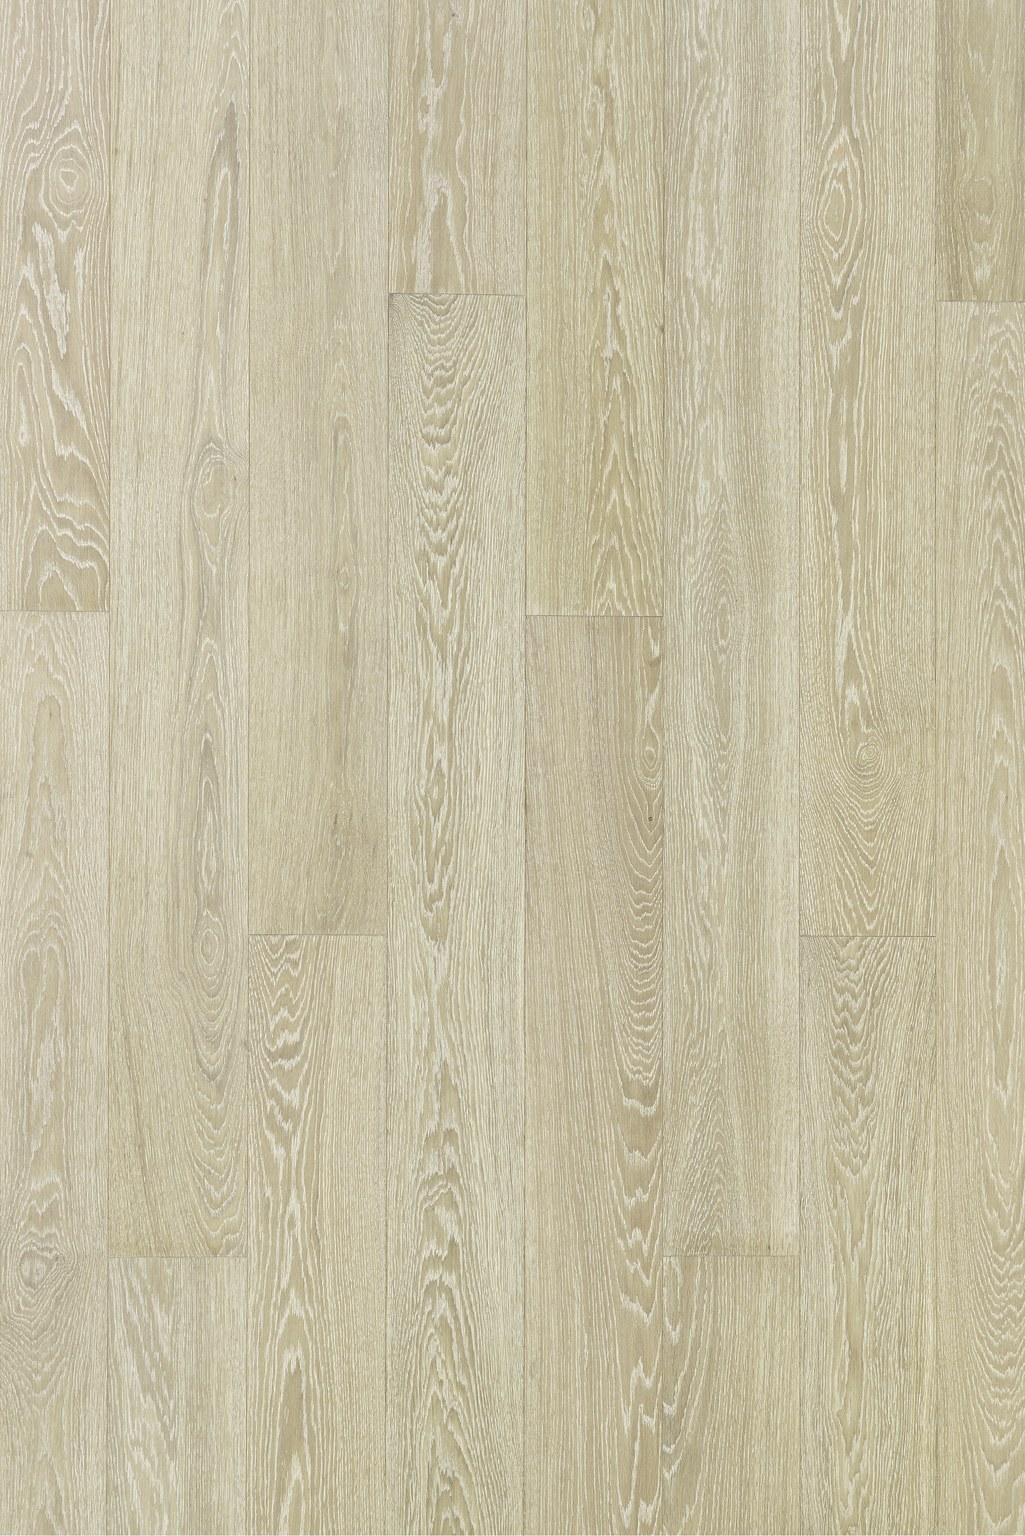 Timberwise Parketti Lankkuparketti Puulattia Wooden Floor Parquet Plank Tammi Oak Select Arctic 2D1